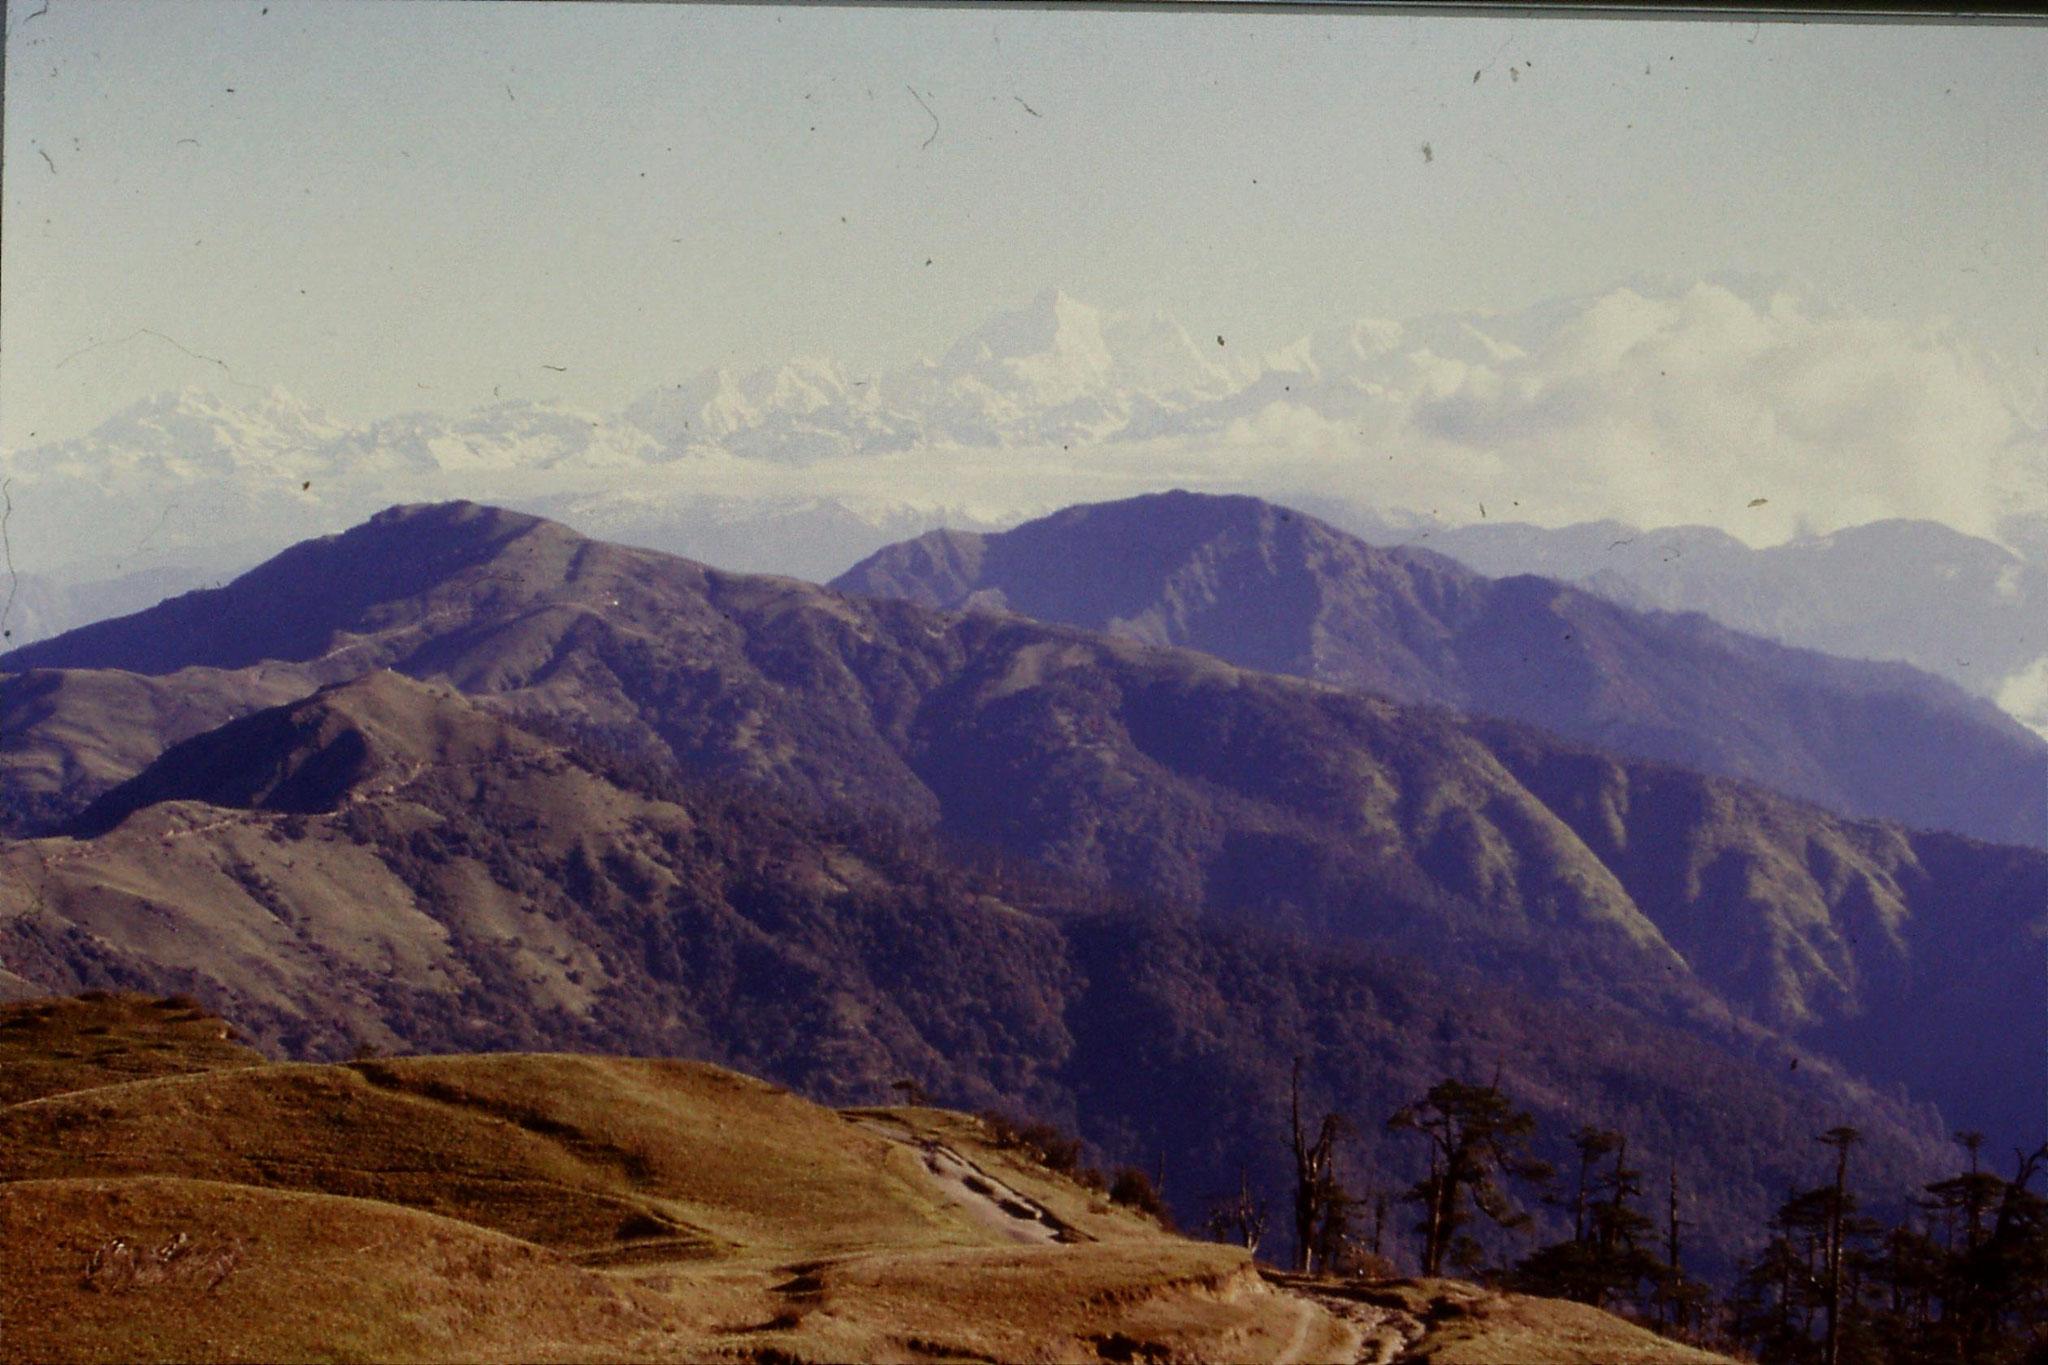 8/5/1990: 27: Kanchenjunga